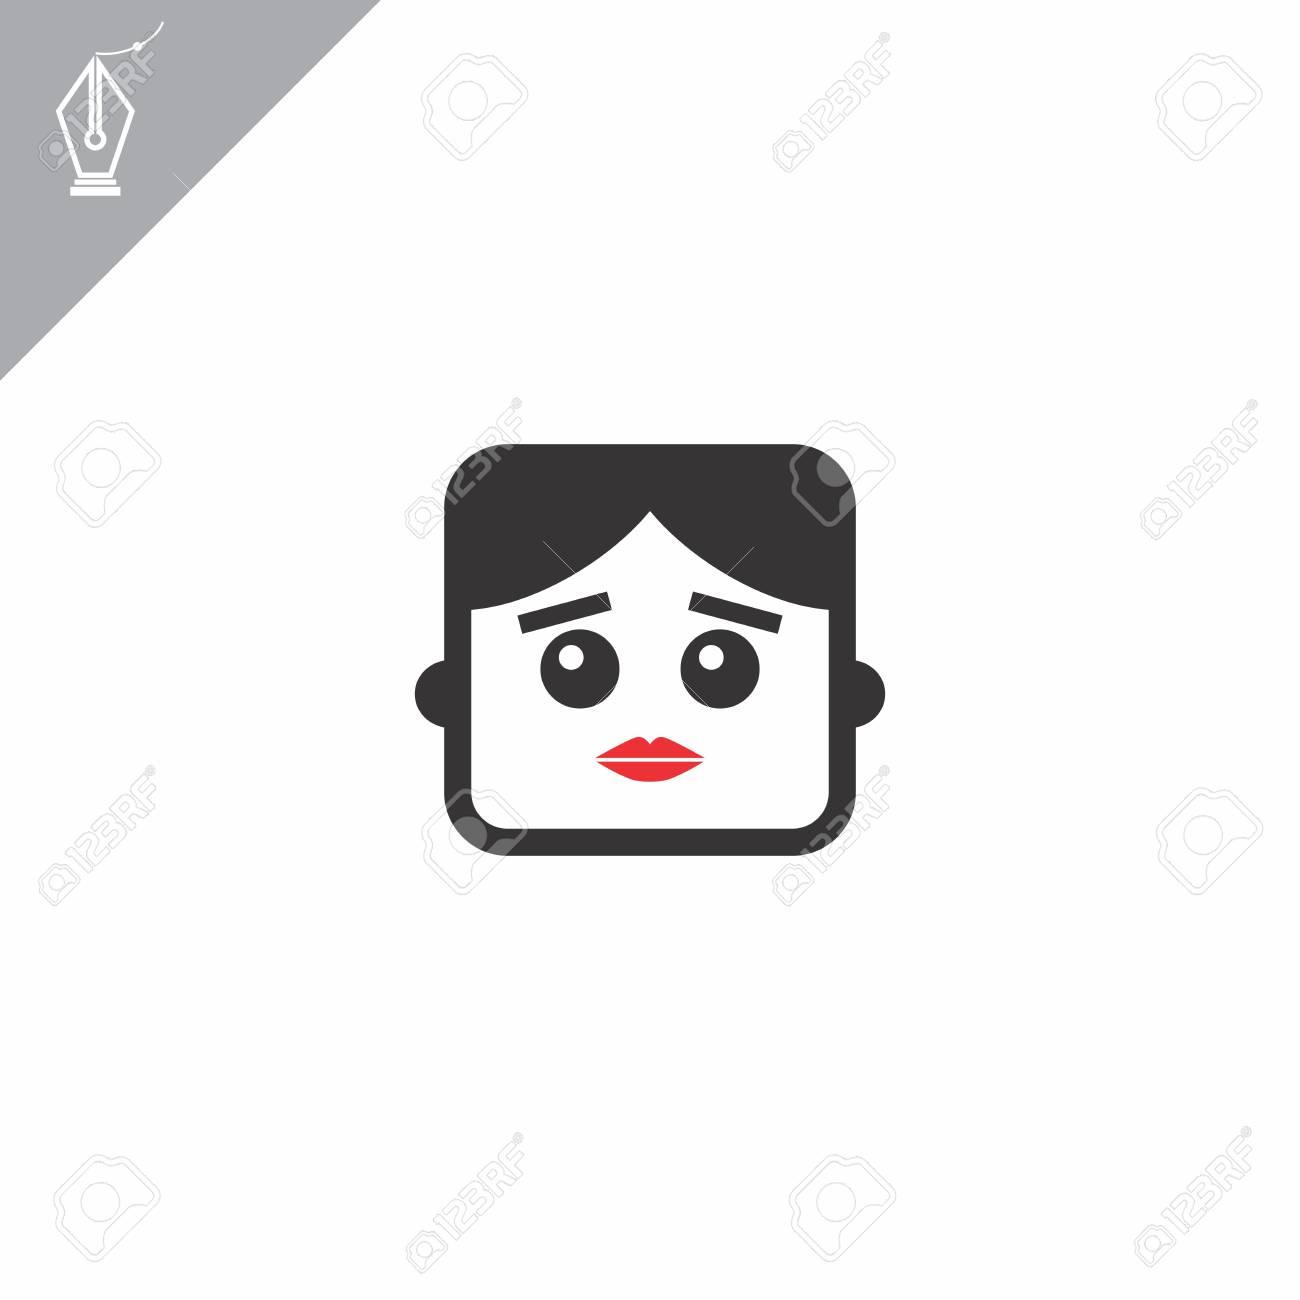 avatar portrait picture icon Stock Vector - 28008464